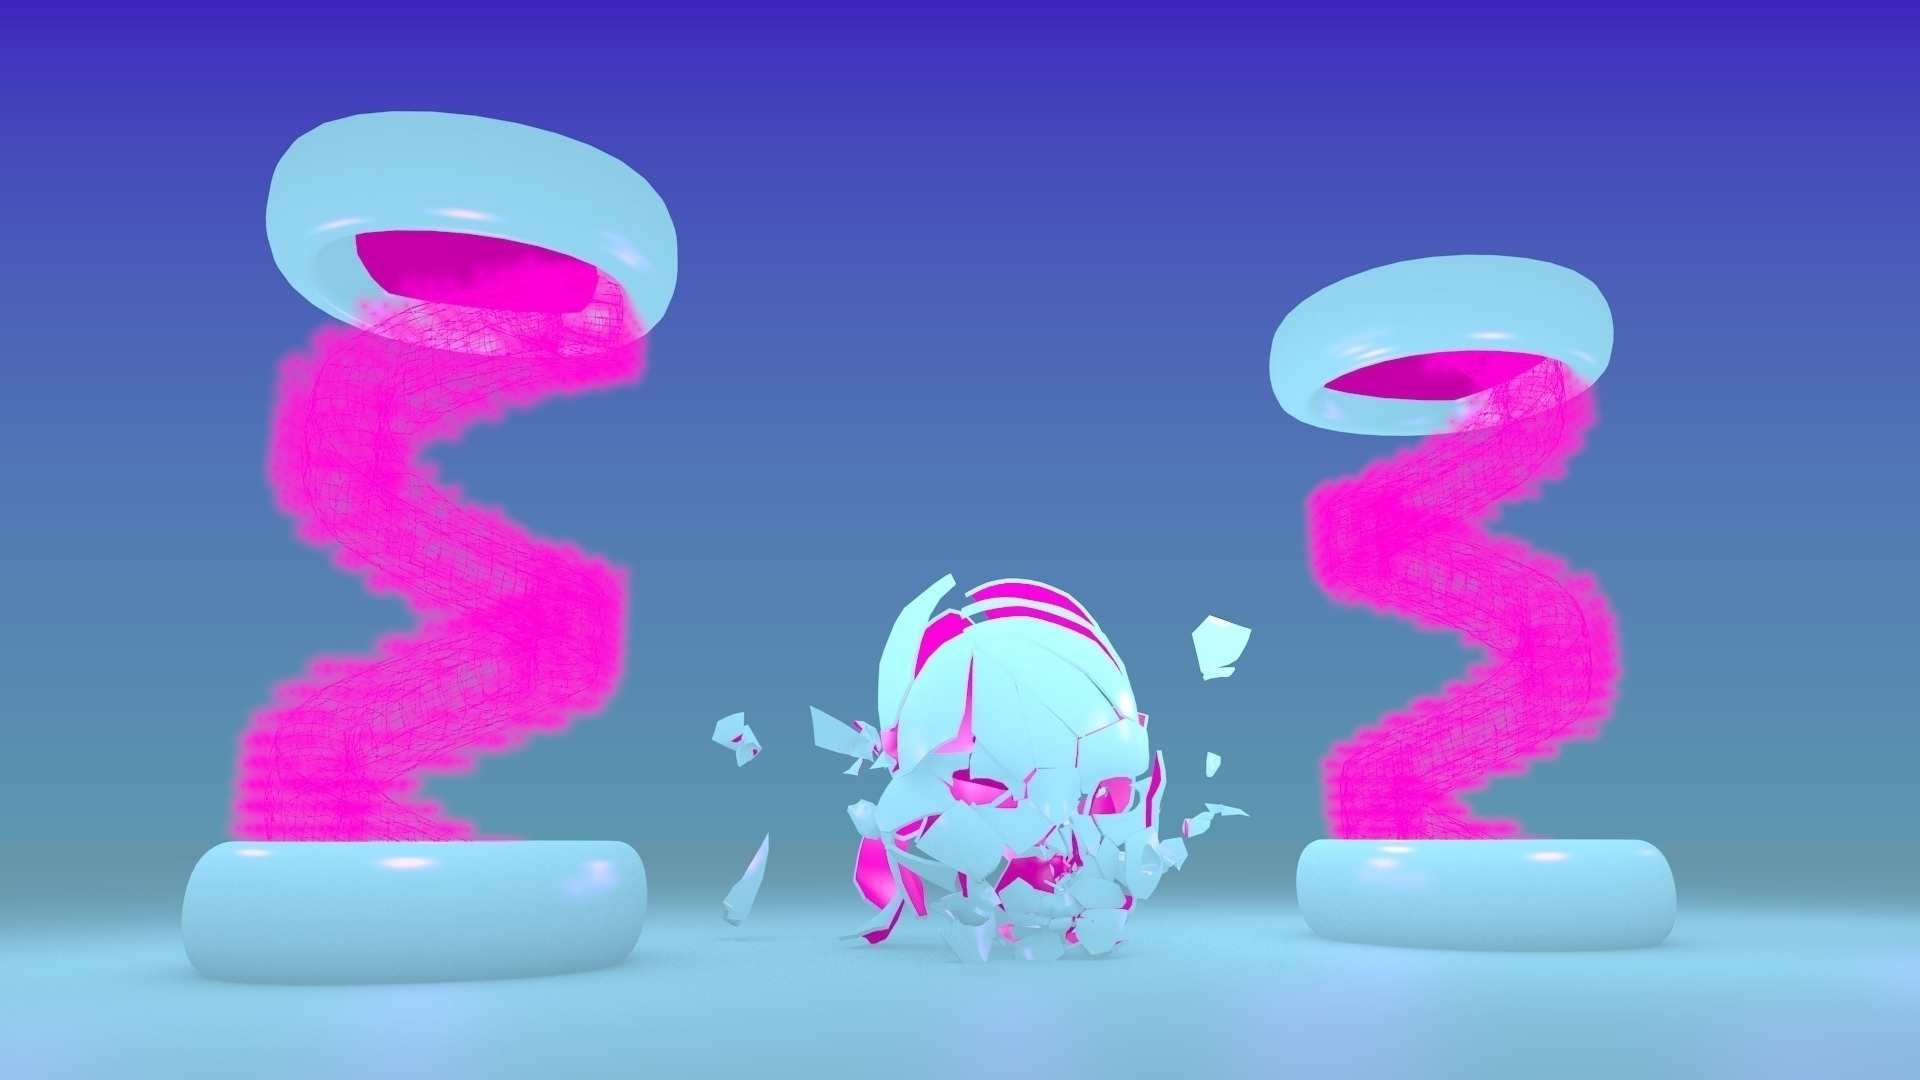 Human Evolution - 3D, 3dart, art - dzproduction | ello